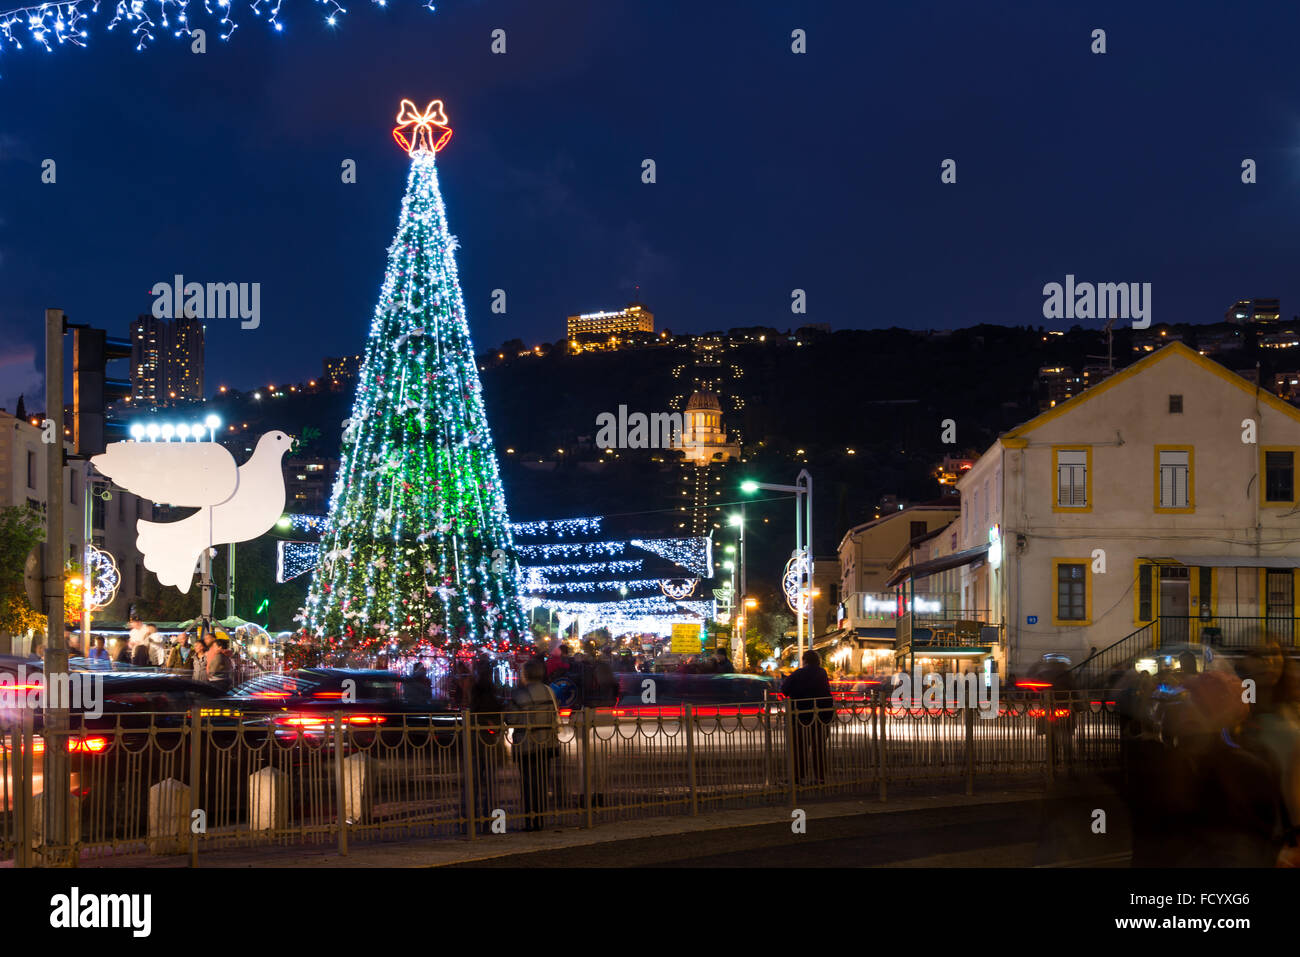 The Holiday of Holidays celebrations in Haifa, 2015 - Stock Image